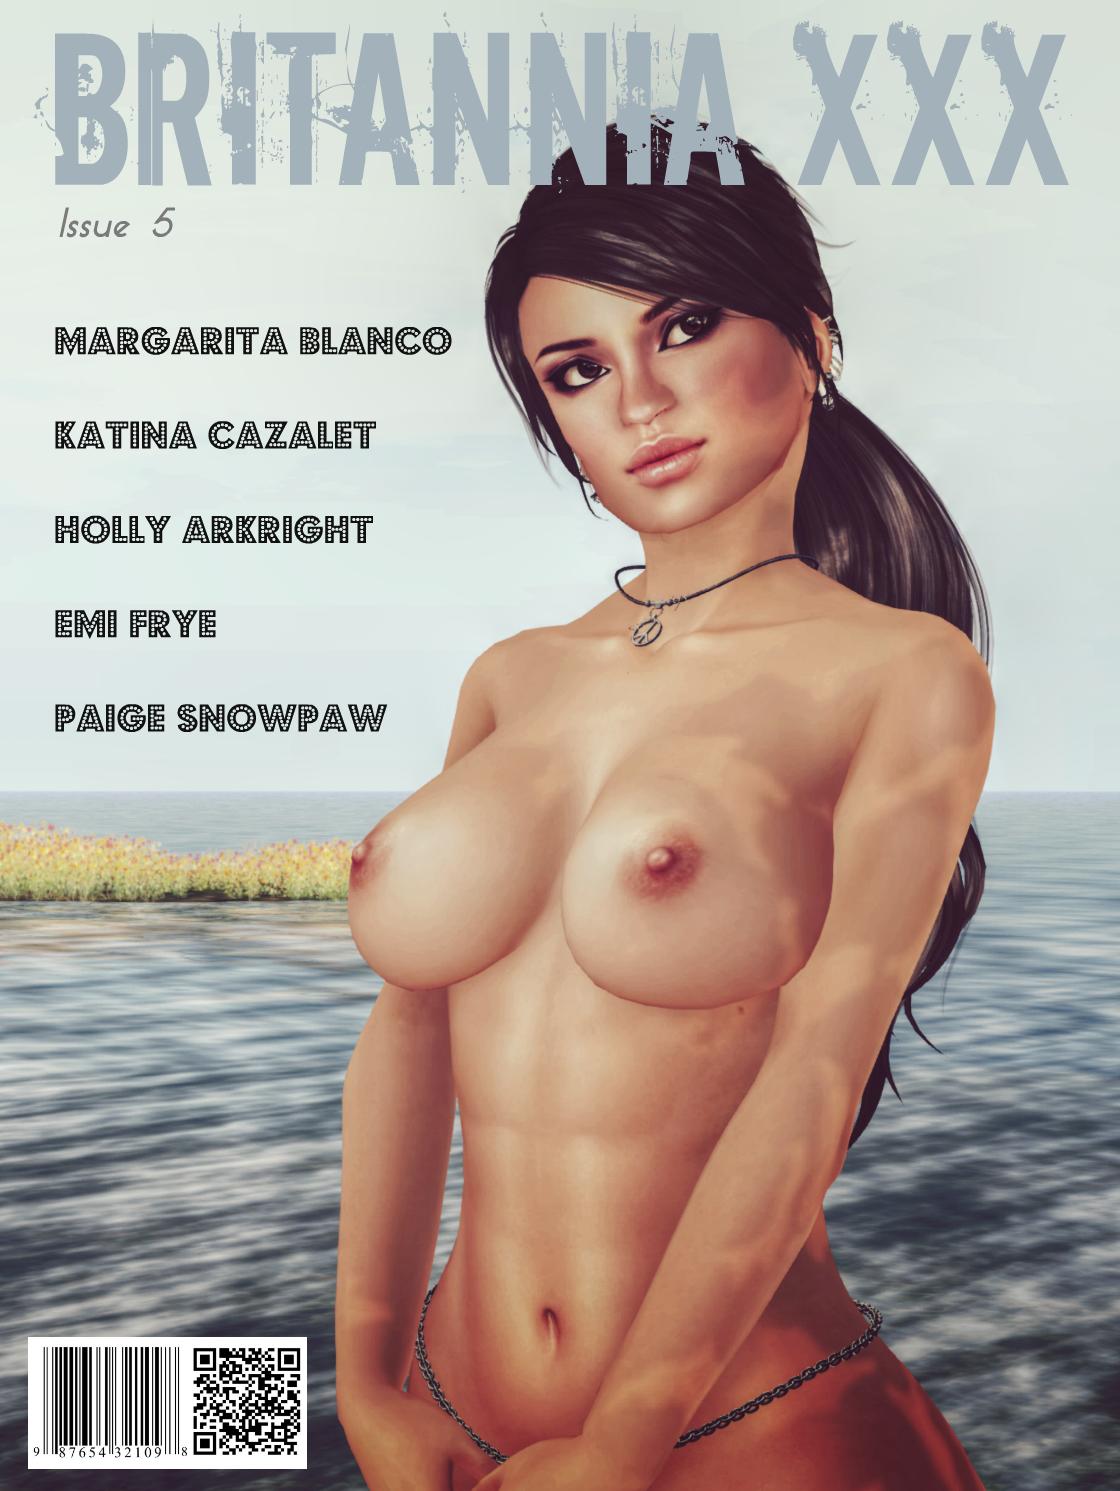 Britannia XXX issue 5